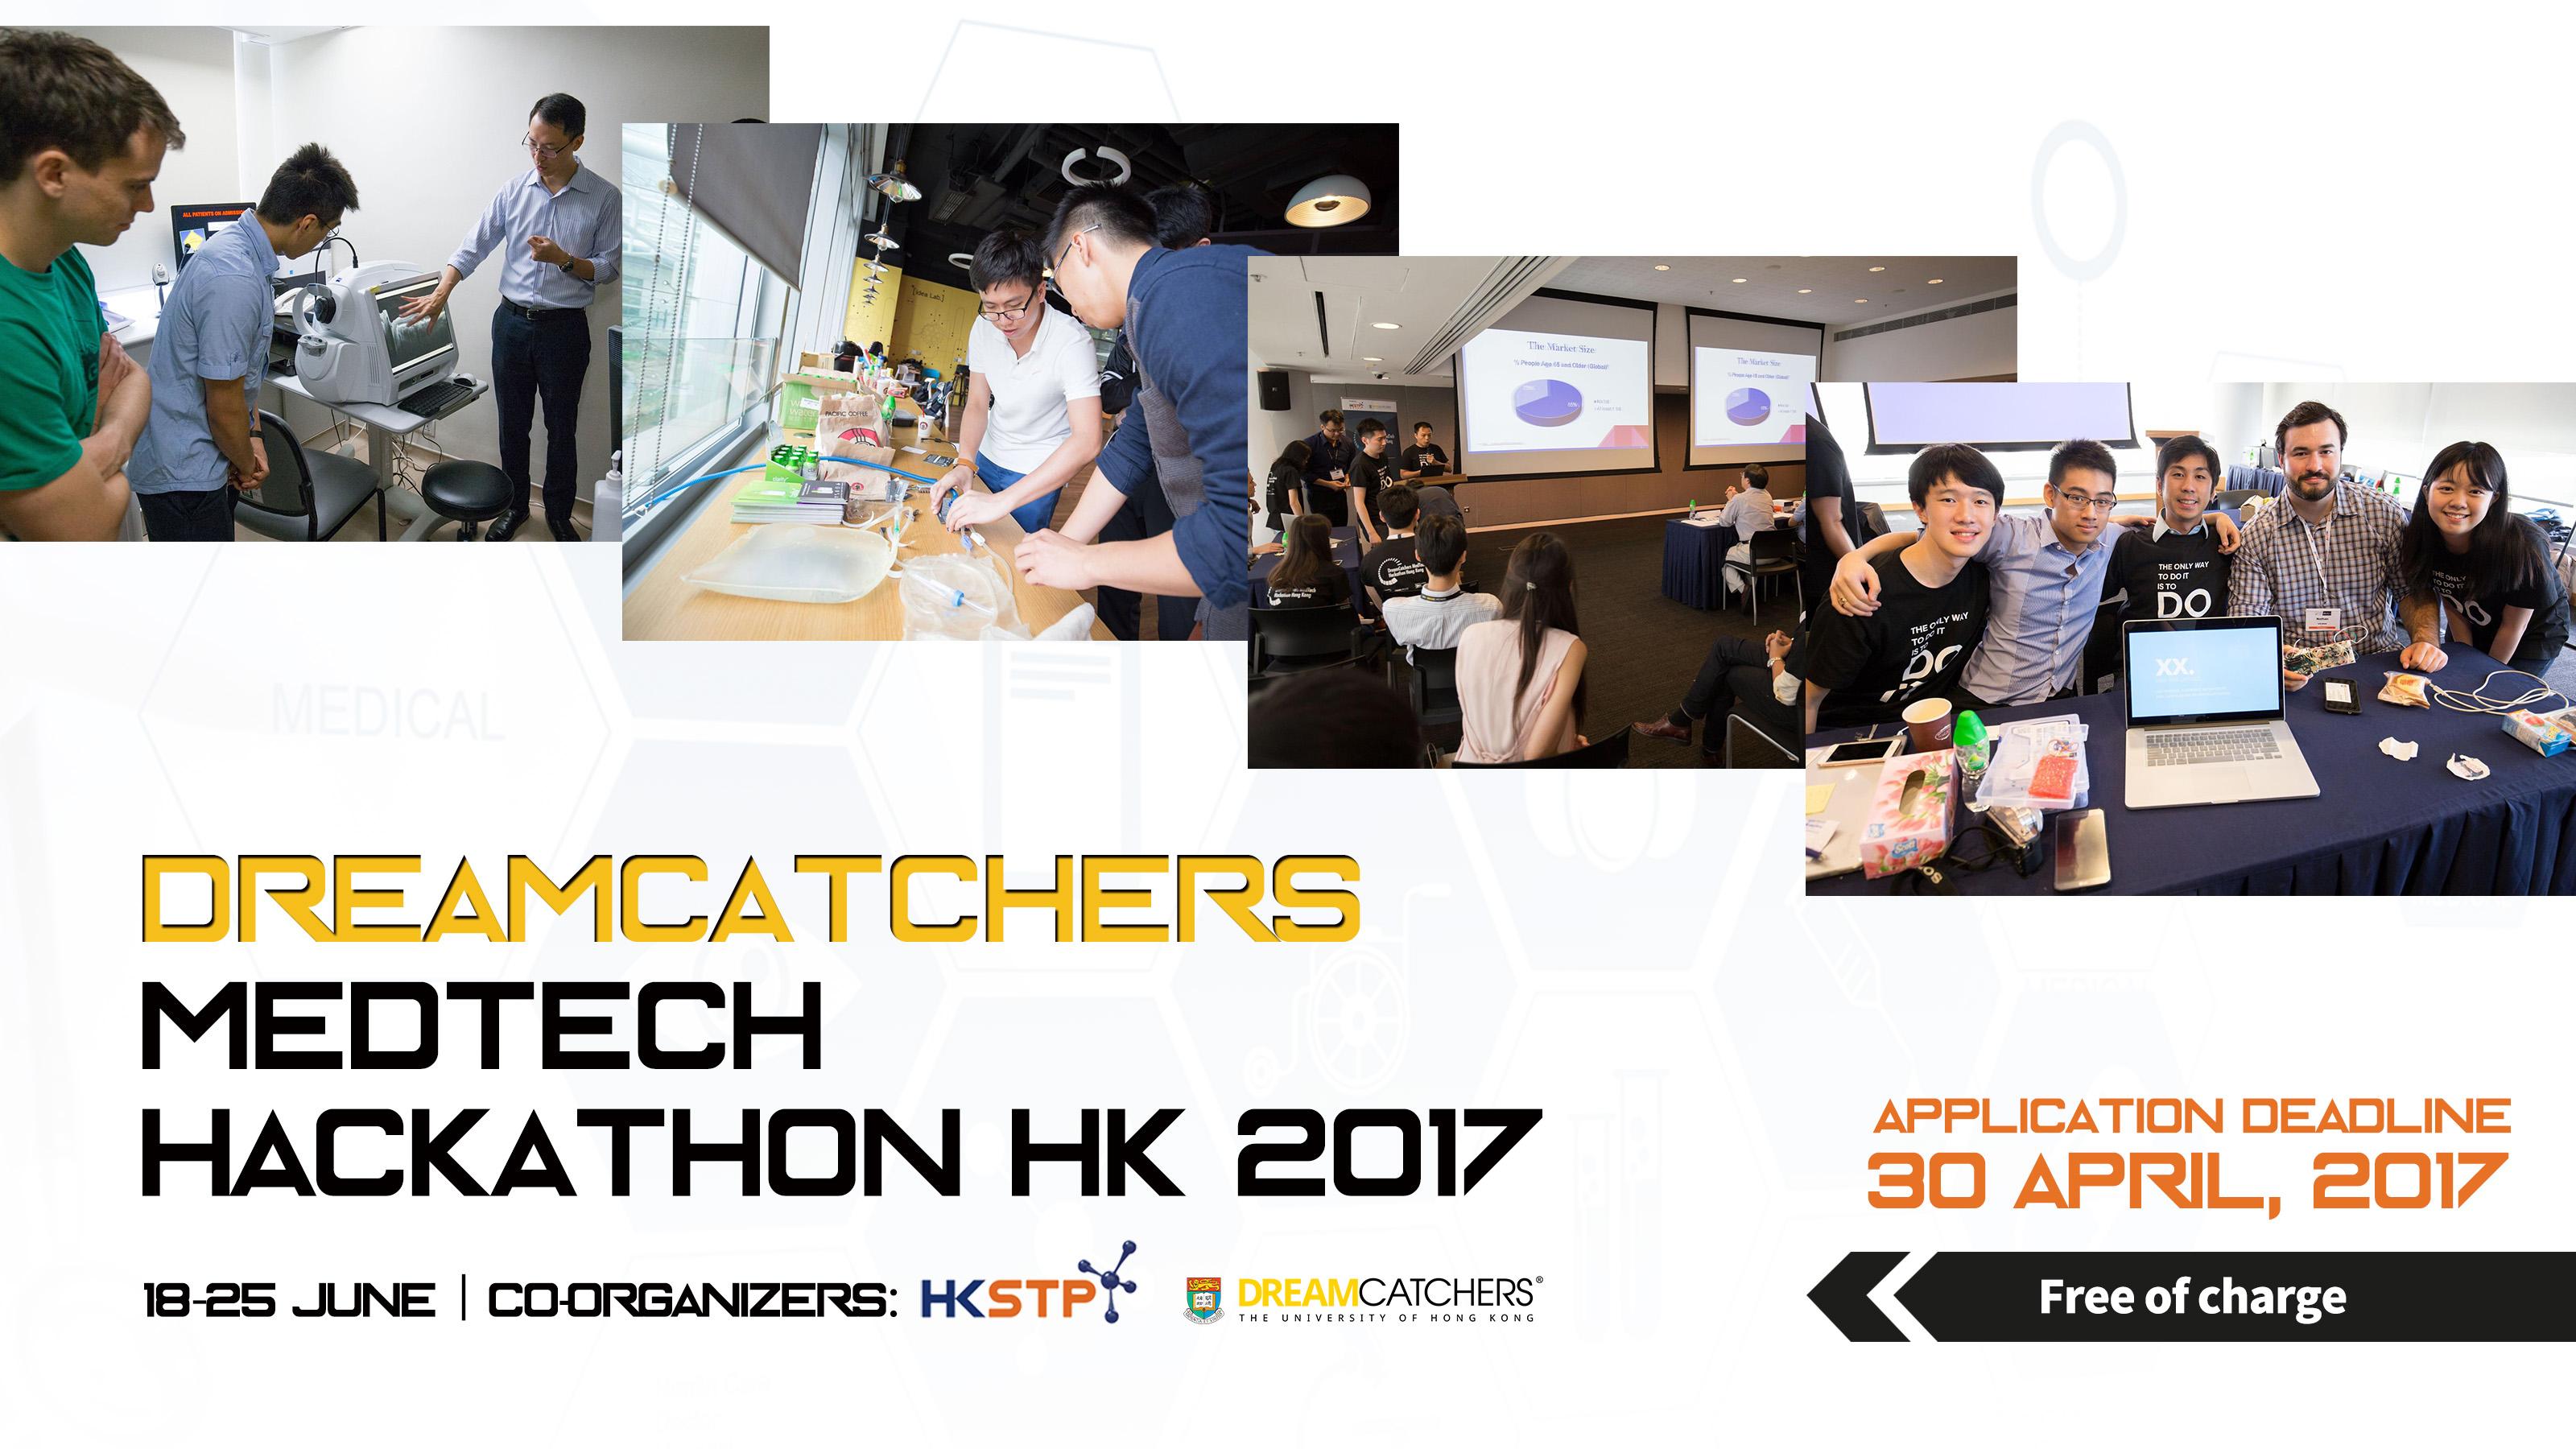 Hackathon_ad_20170430_v2